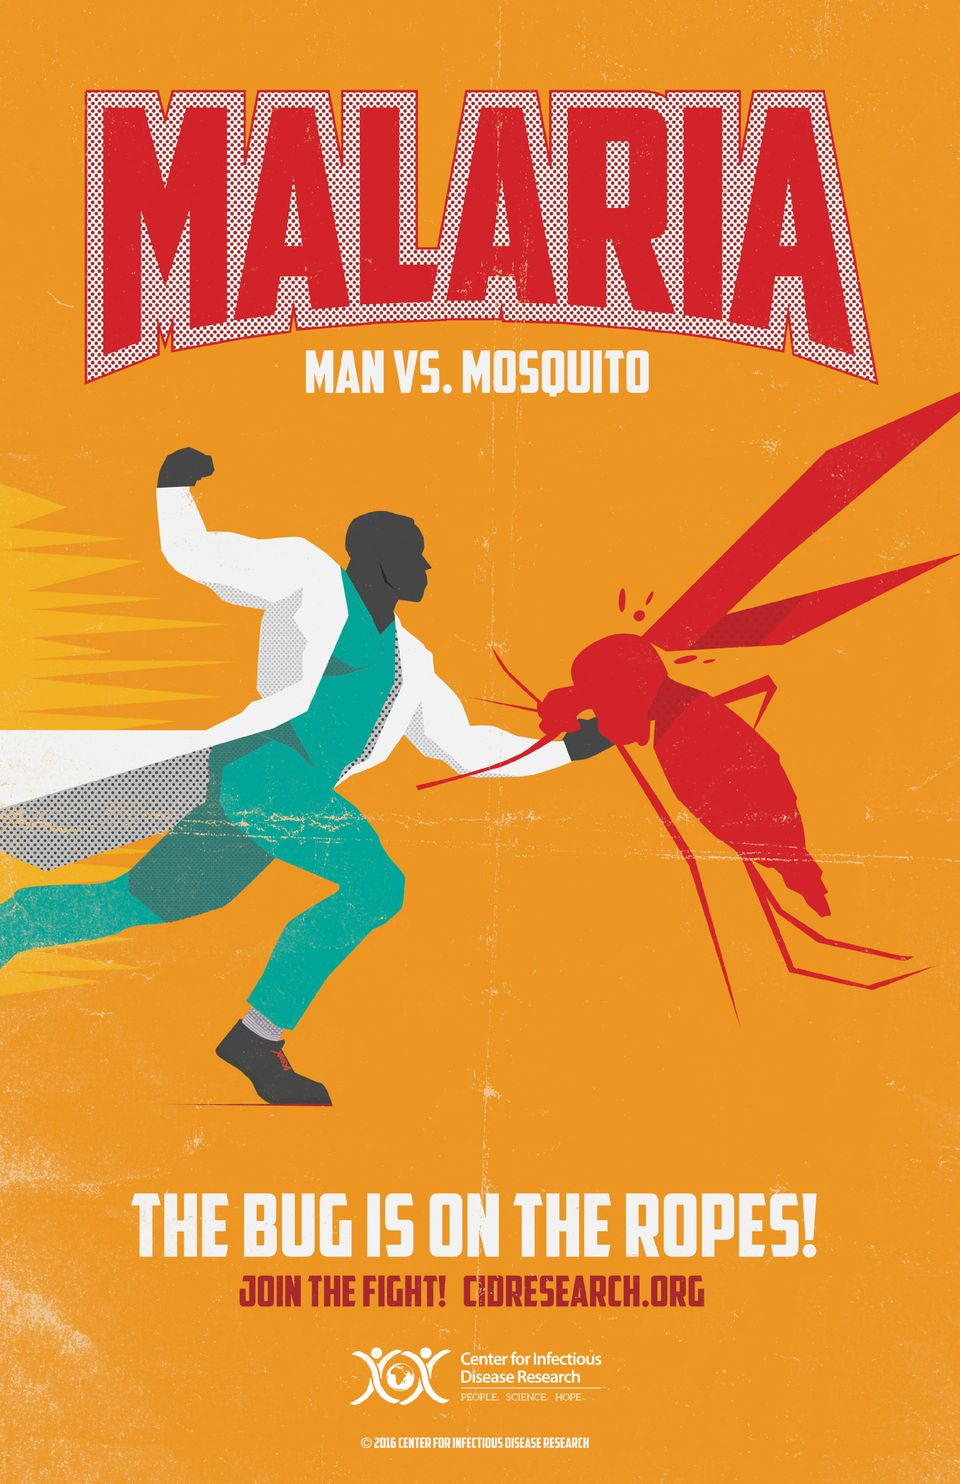 retro disease fighting posters make public health cool again